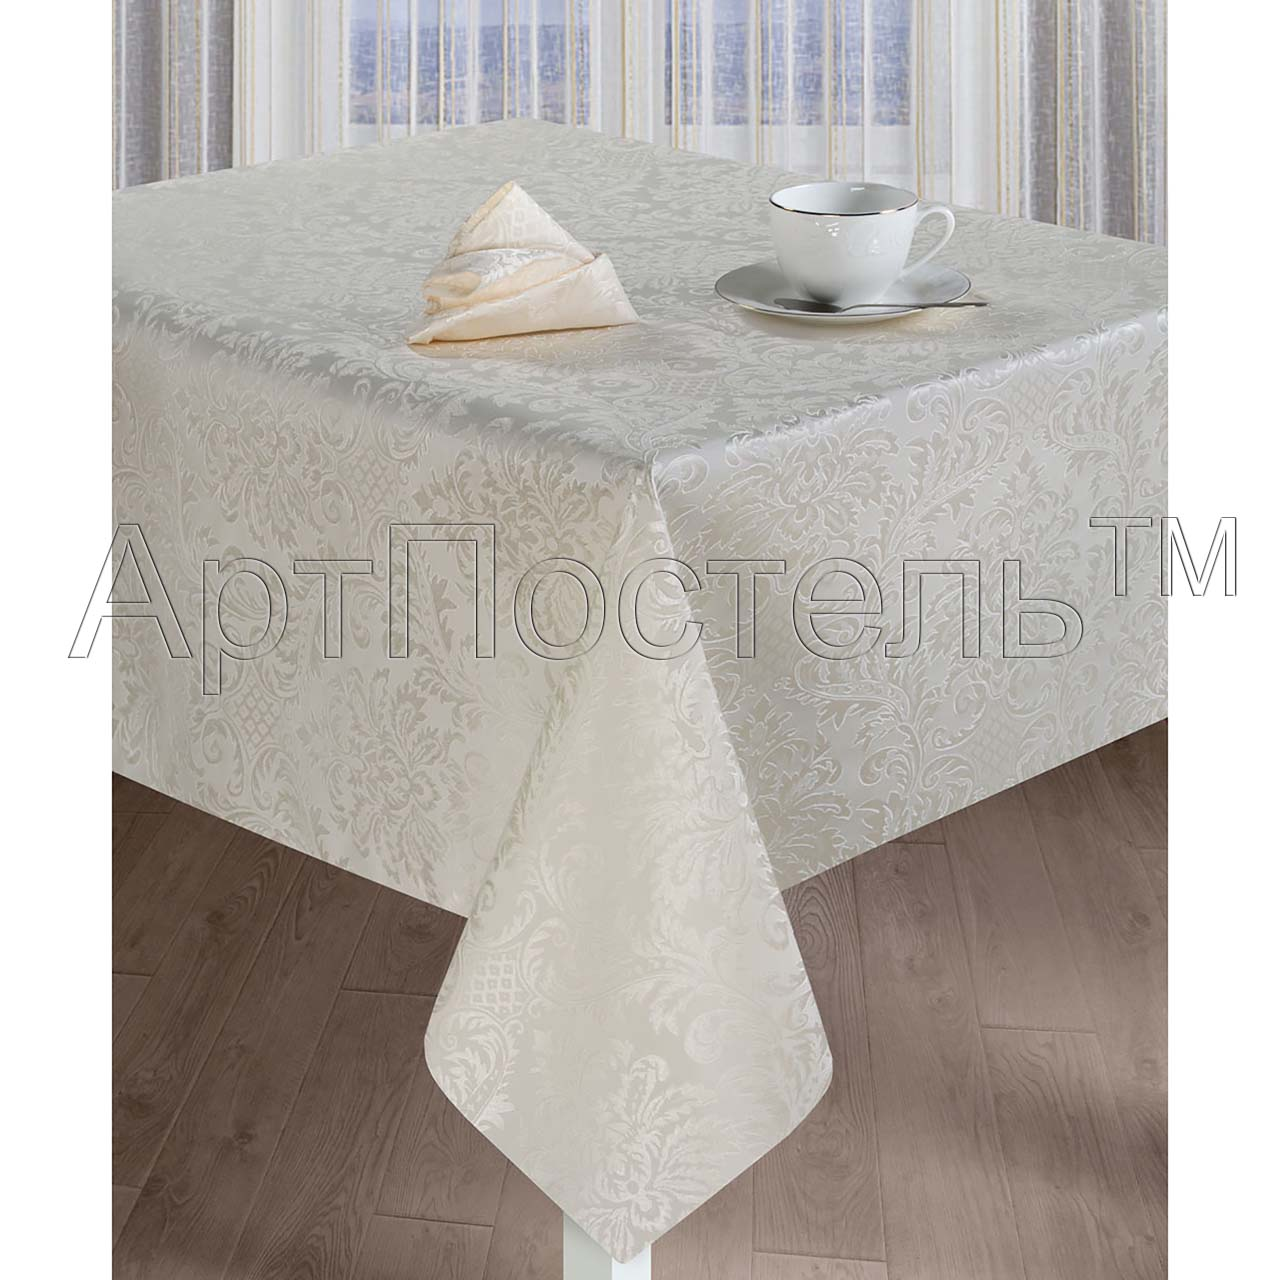 Кухонные принадлежности  Ирэн  Шампань р. 260х150 - Текстиль для дома артикул: 24543